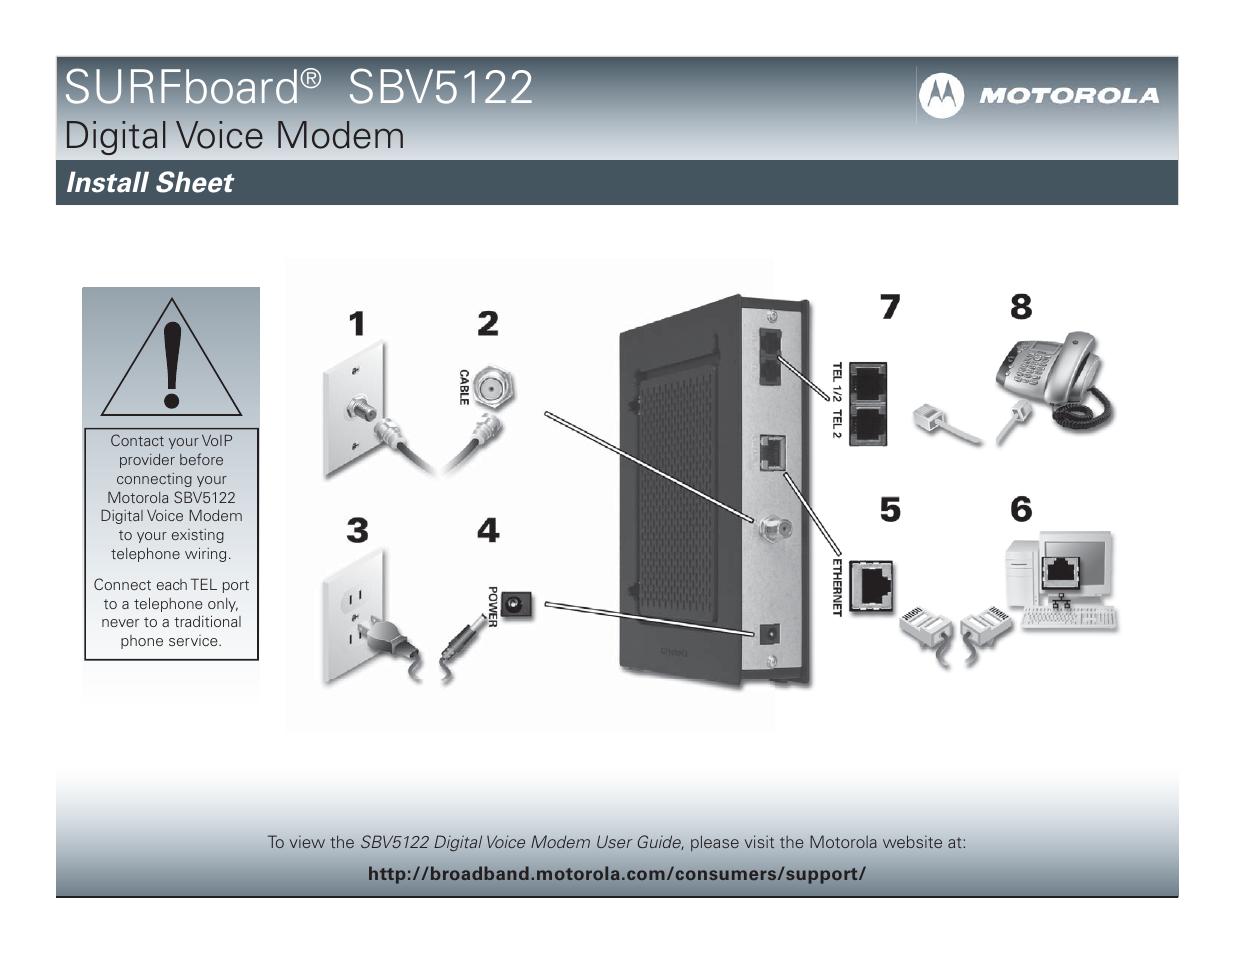 Motorola Surfboard Sbv5122 User Manual Manual Guide